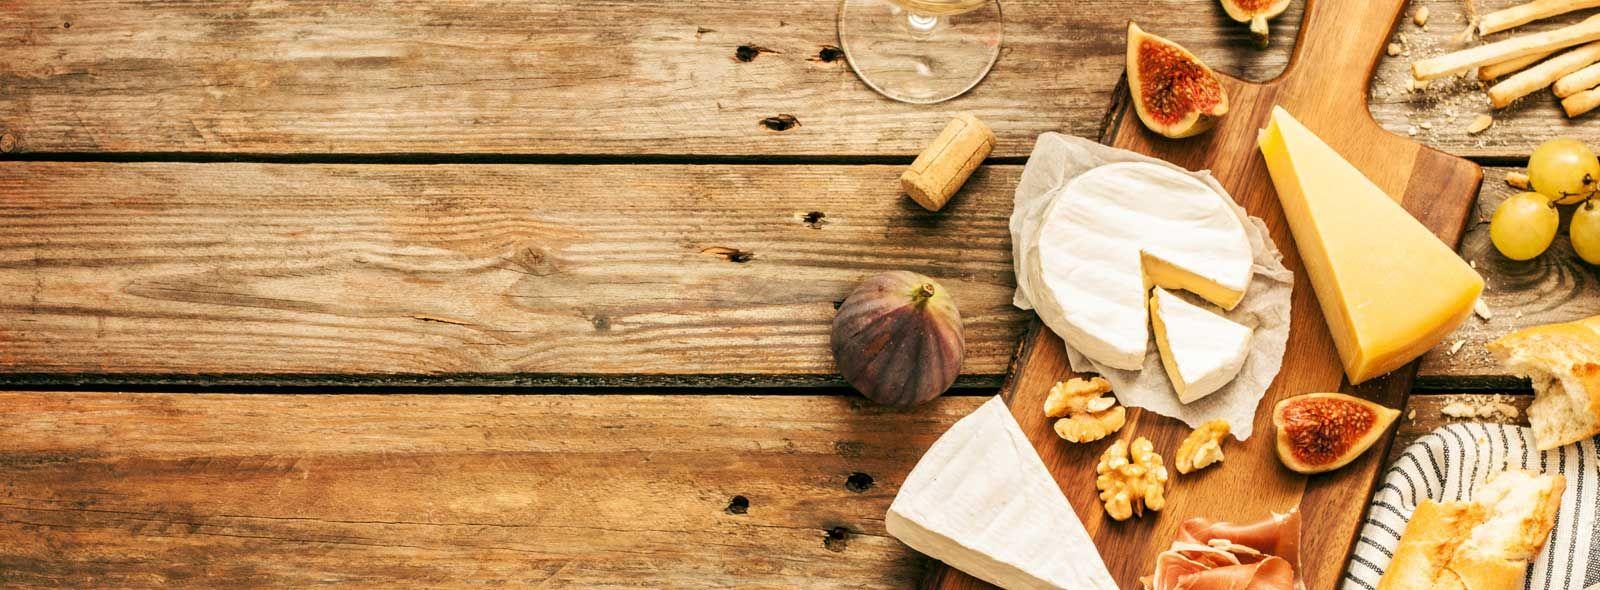 L'oro bianco d'Italia: i formaggi piemontesi